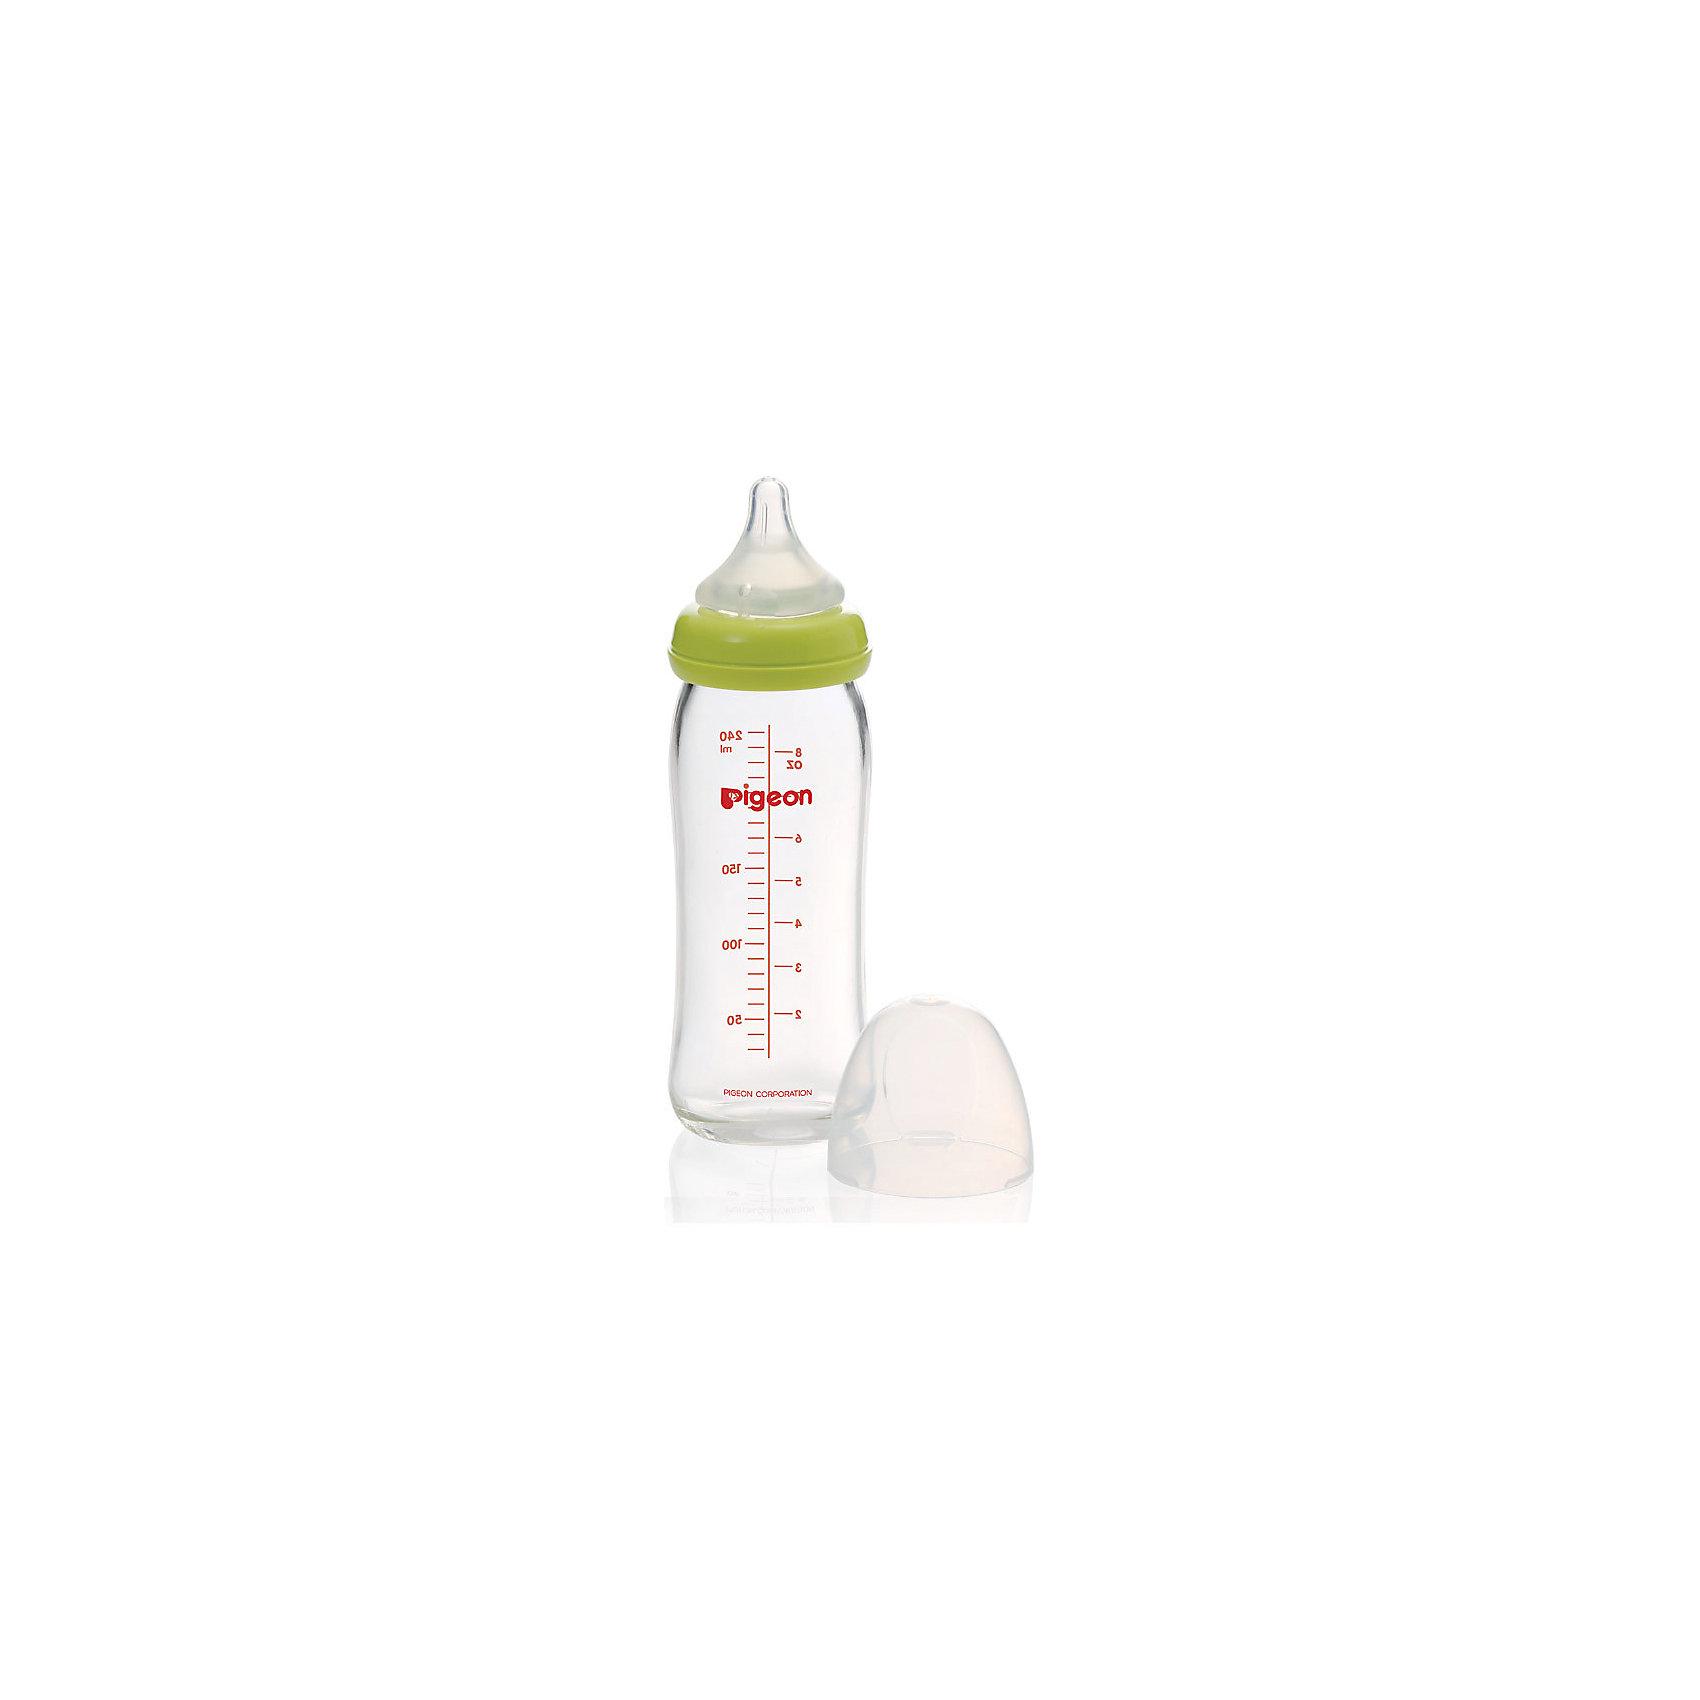 Бутылочка Перистальтик Плюс с широким горлышком 240мл, стекло, Pigeon